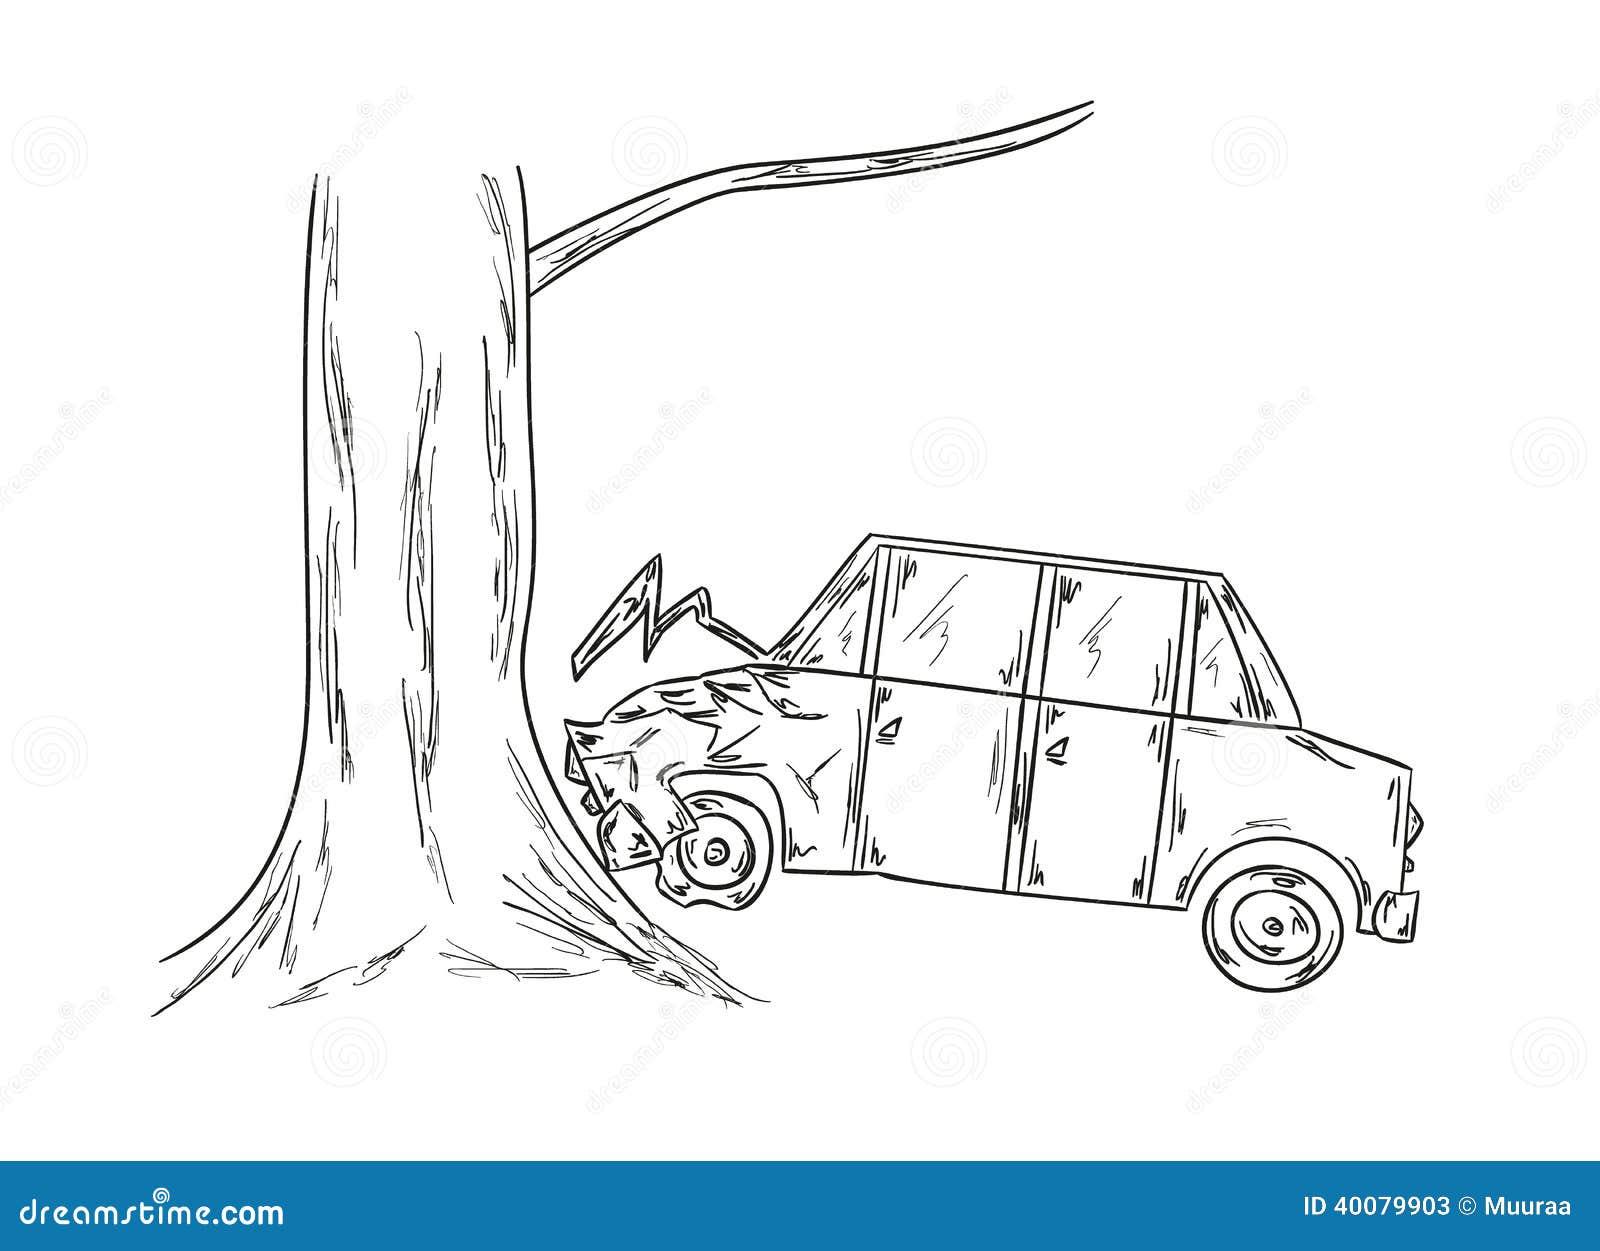 Autounfallskizze vektor abbildung. Illustration von beschädigung ...